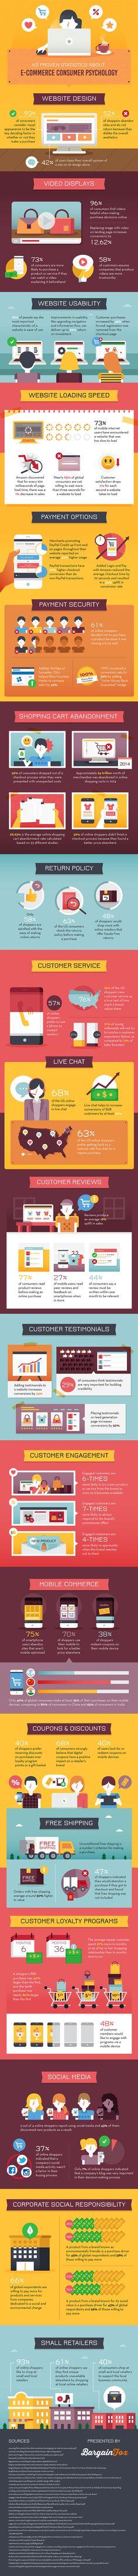 eCommerce Consumer Psychology: 65 Proven Statistics Infographic. Topic: marketing, webdesign